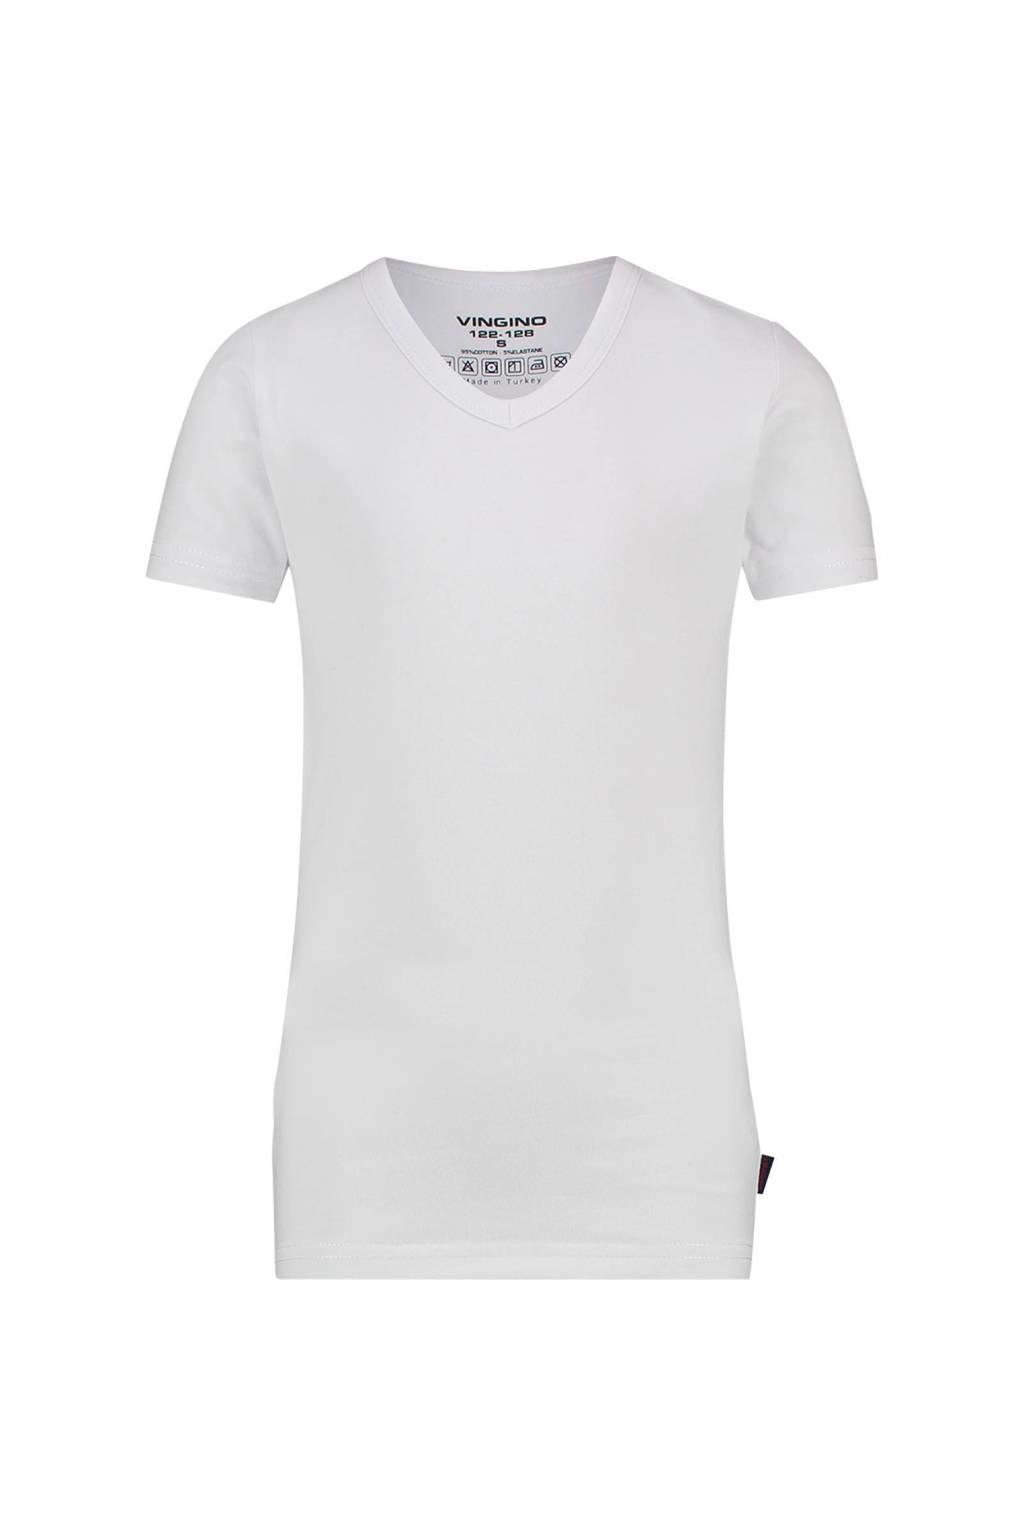 Vingino T-shirt wit, Wit